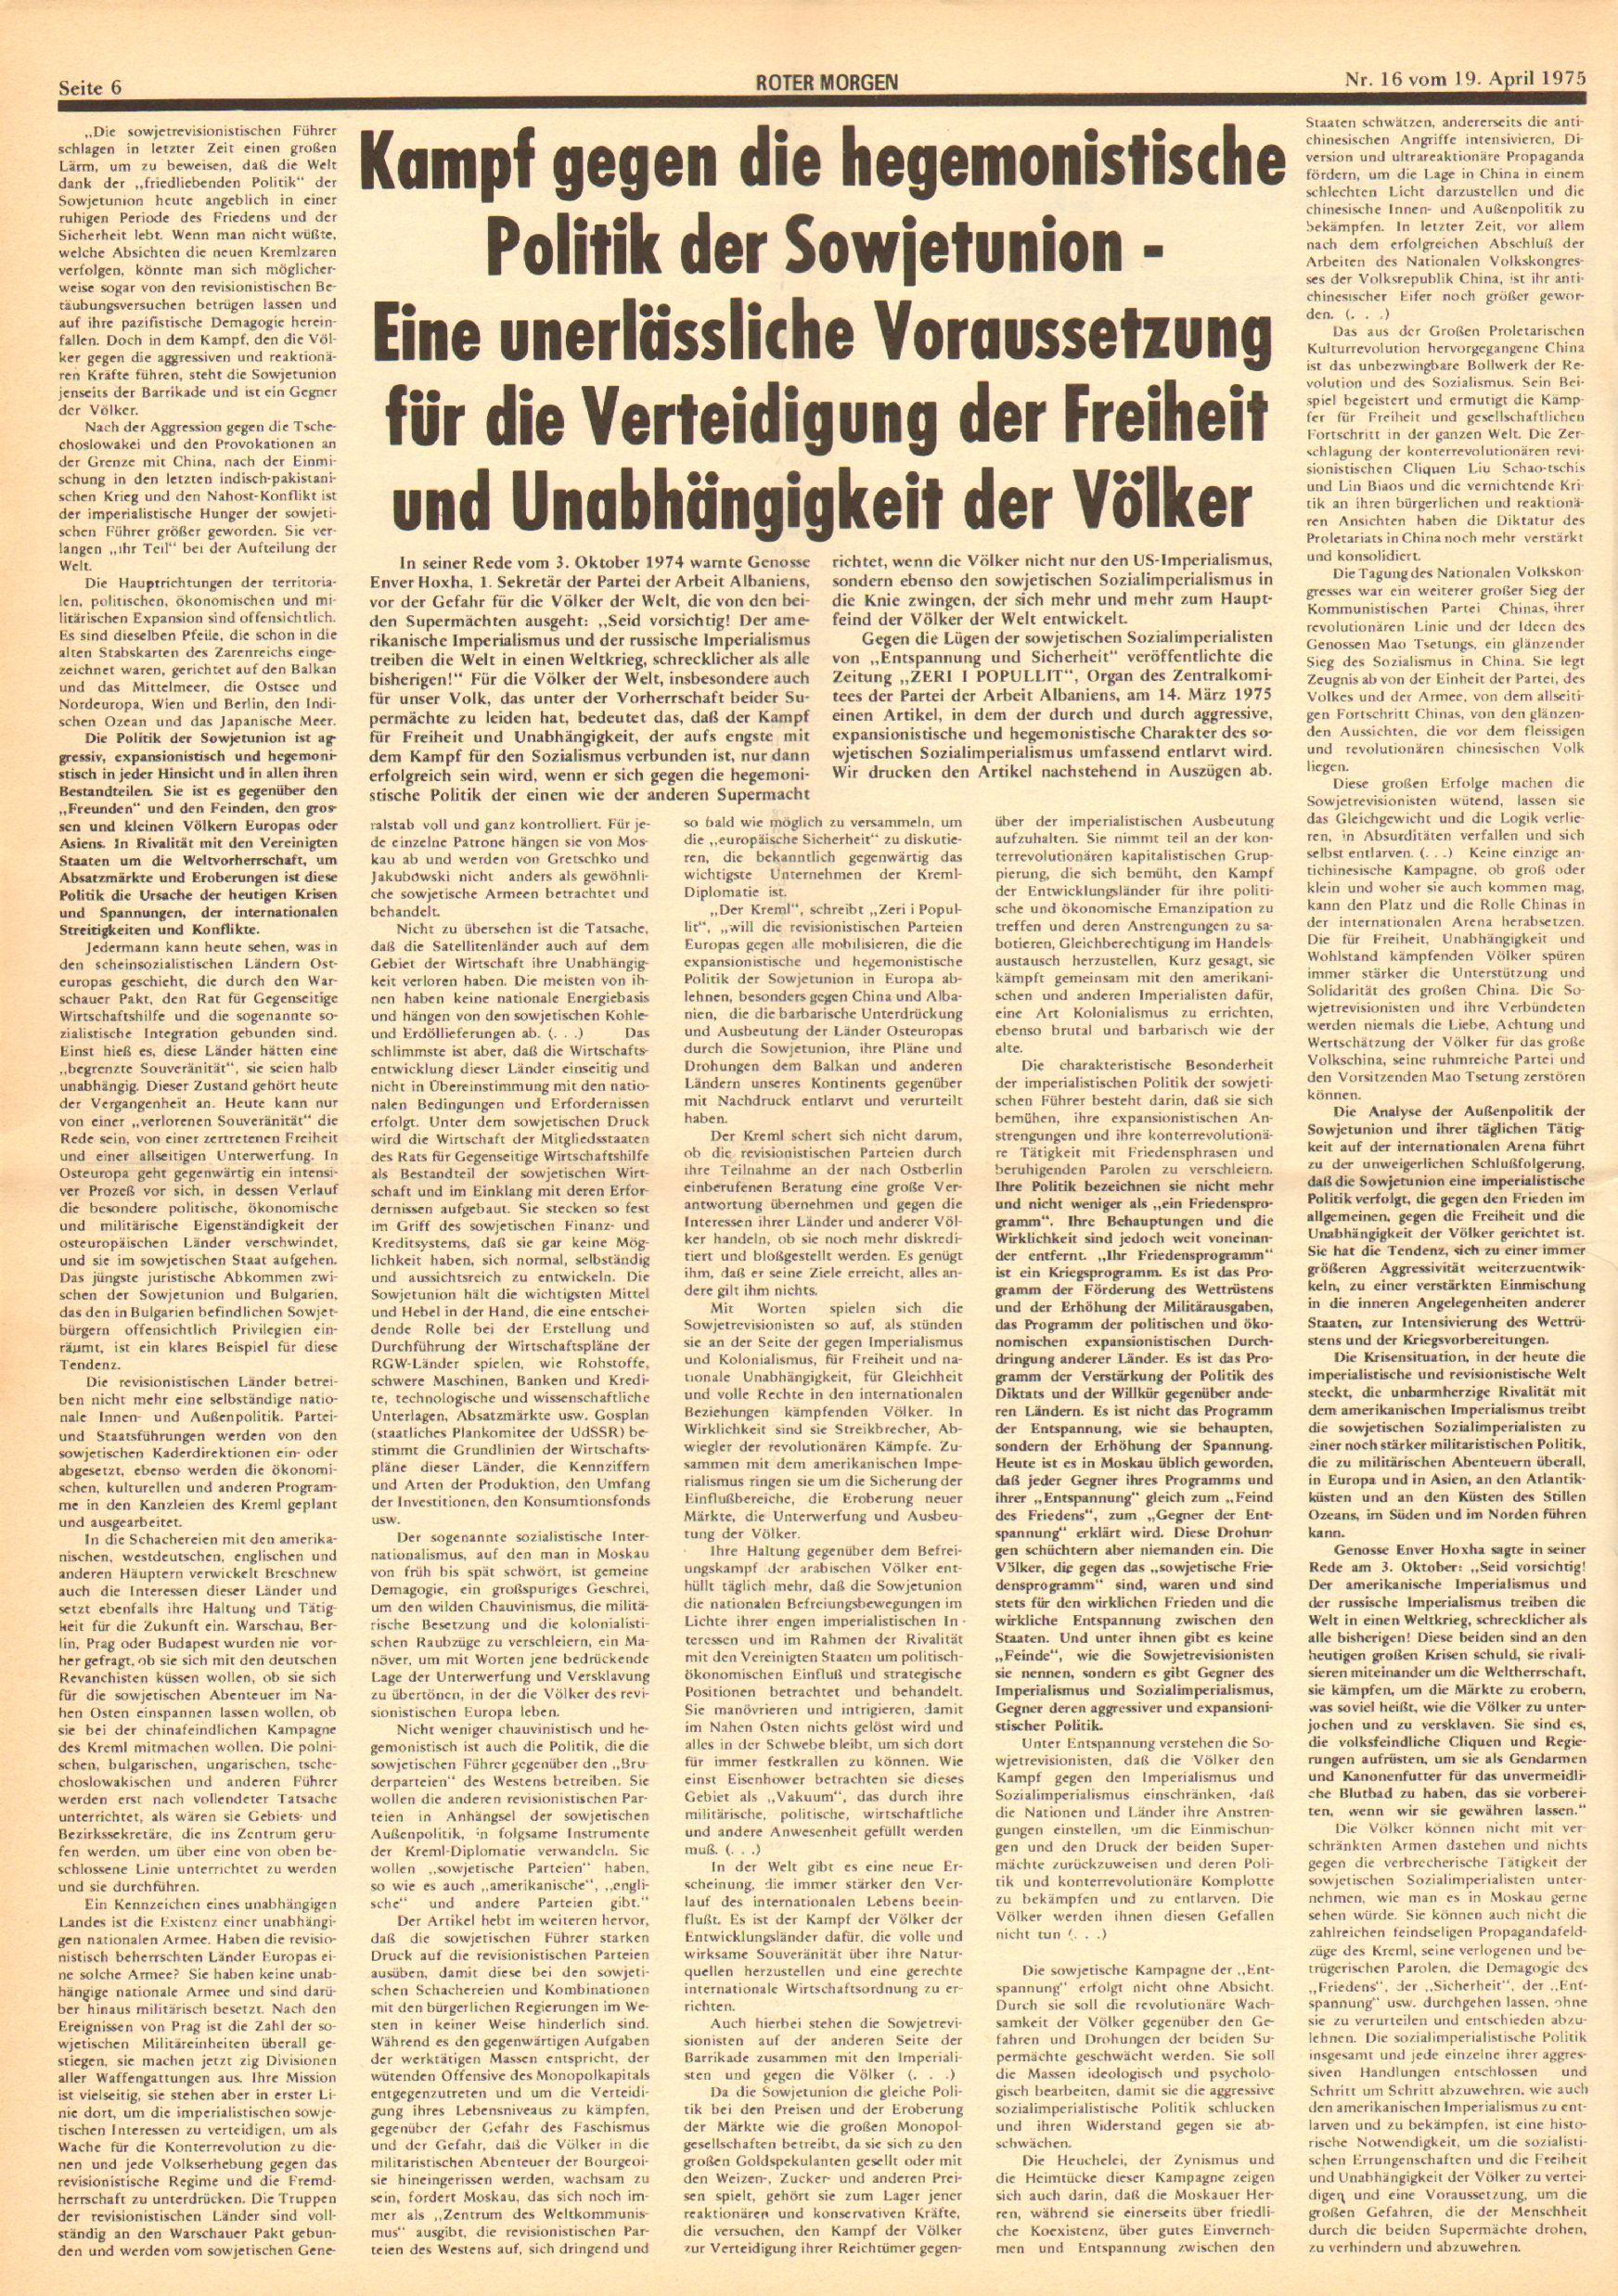 Roter Morgen, 9. Jg., 19. April 1975, Nr. 16, Seite 6